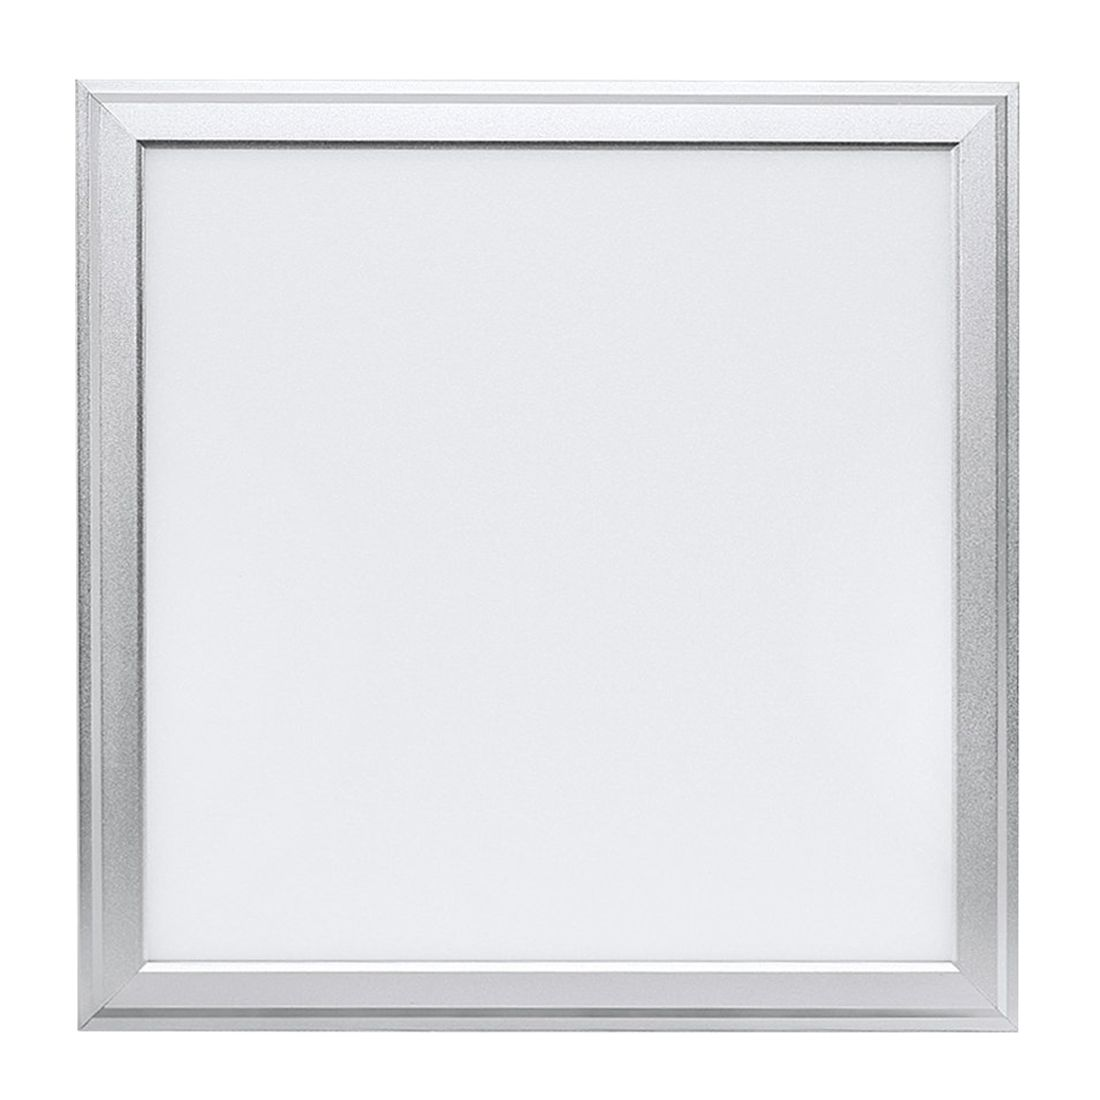 Ultraslim Square 30X30cm Daylight Warm White LED Panel Light Recessed Lamp Pendant Lights Ceiling Set (SMD 2835 ,2800K,18W) kinfire 9 square 18w 1480lm 3000k 90 x smd 3528 led warm white light ceiling lamp ac 85 265v